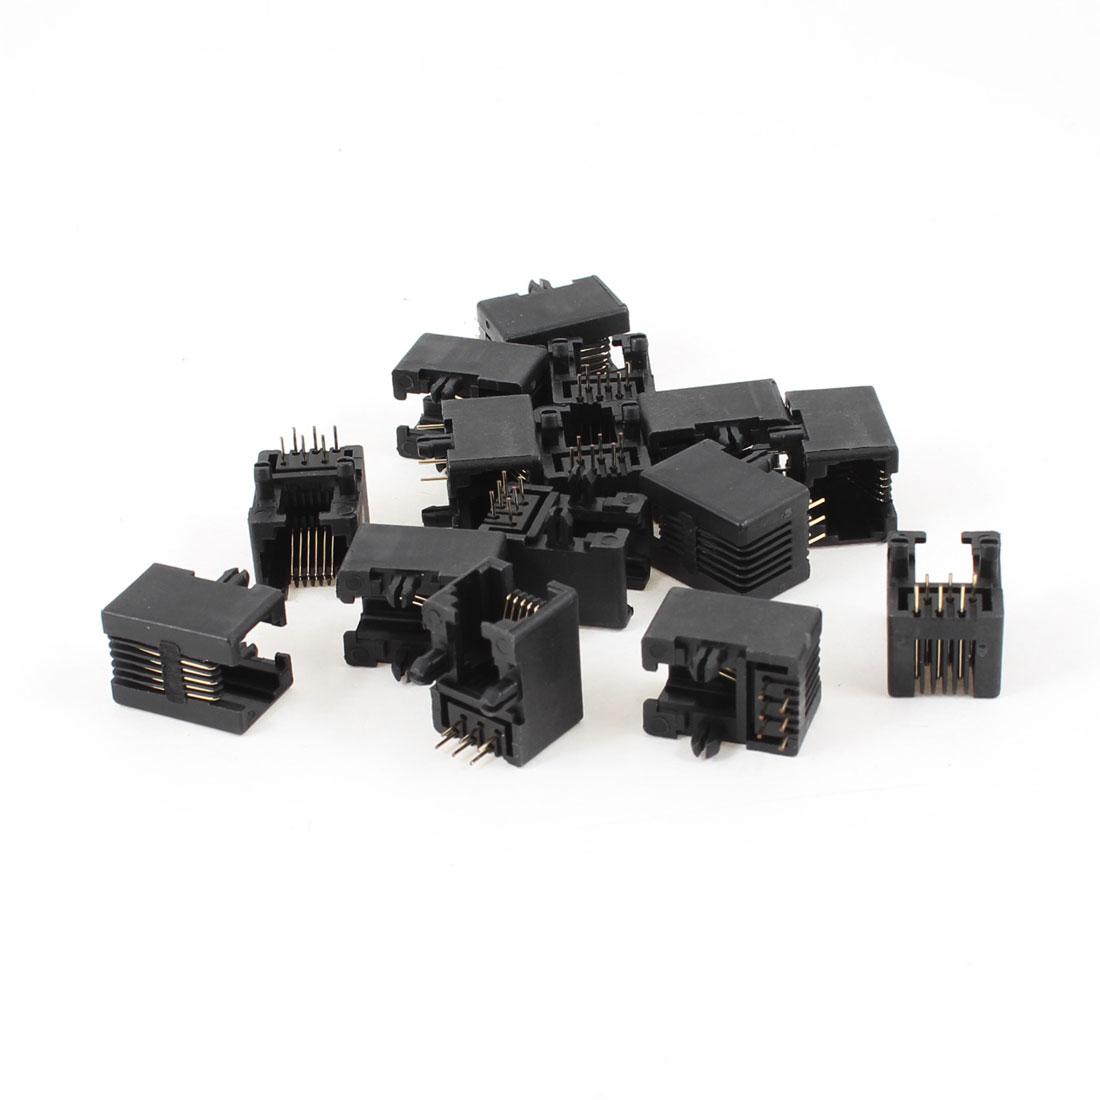 15 Pcs 90 Degree 6 Round Pin RJ12 6P6C Network Modular PCB Connector Jacks Black